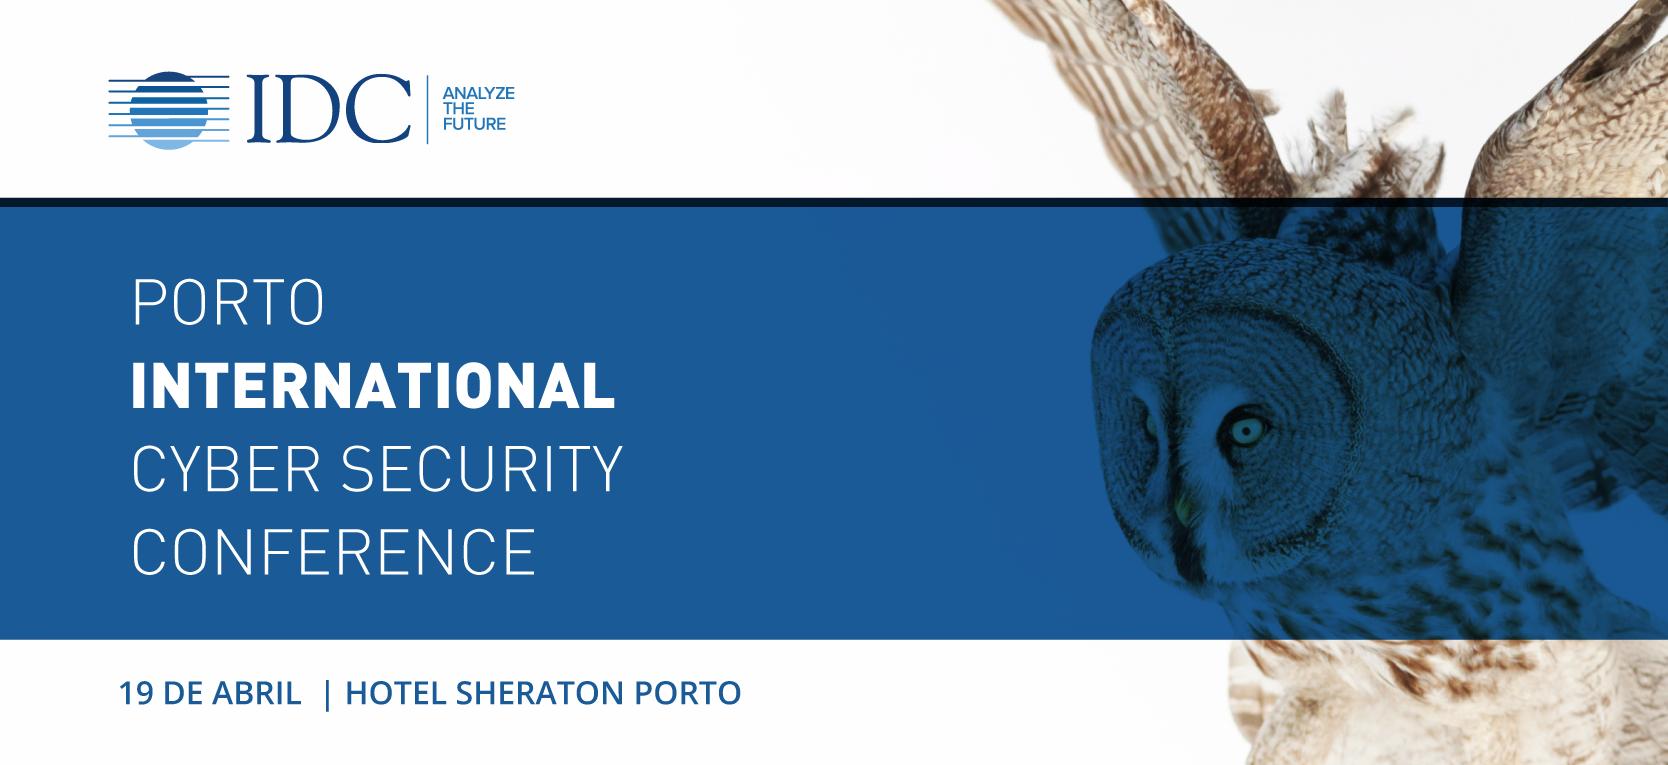 IDC PORTO INTERNATIONAL CYBERSECURITY CONFERENCE 2018